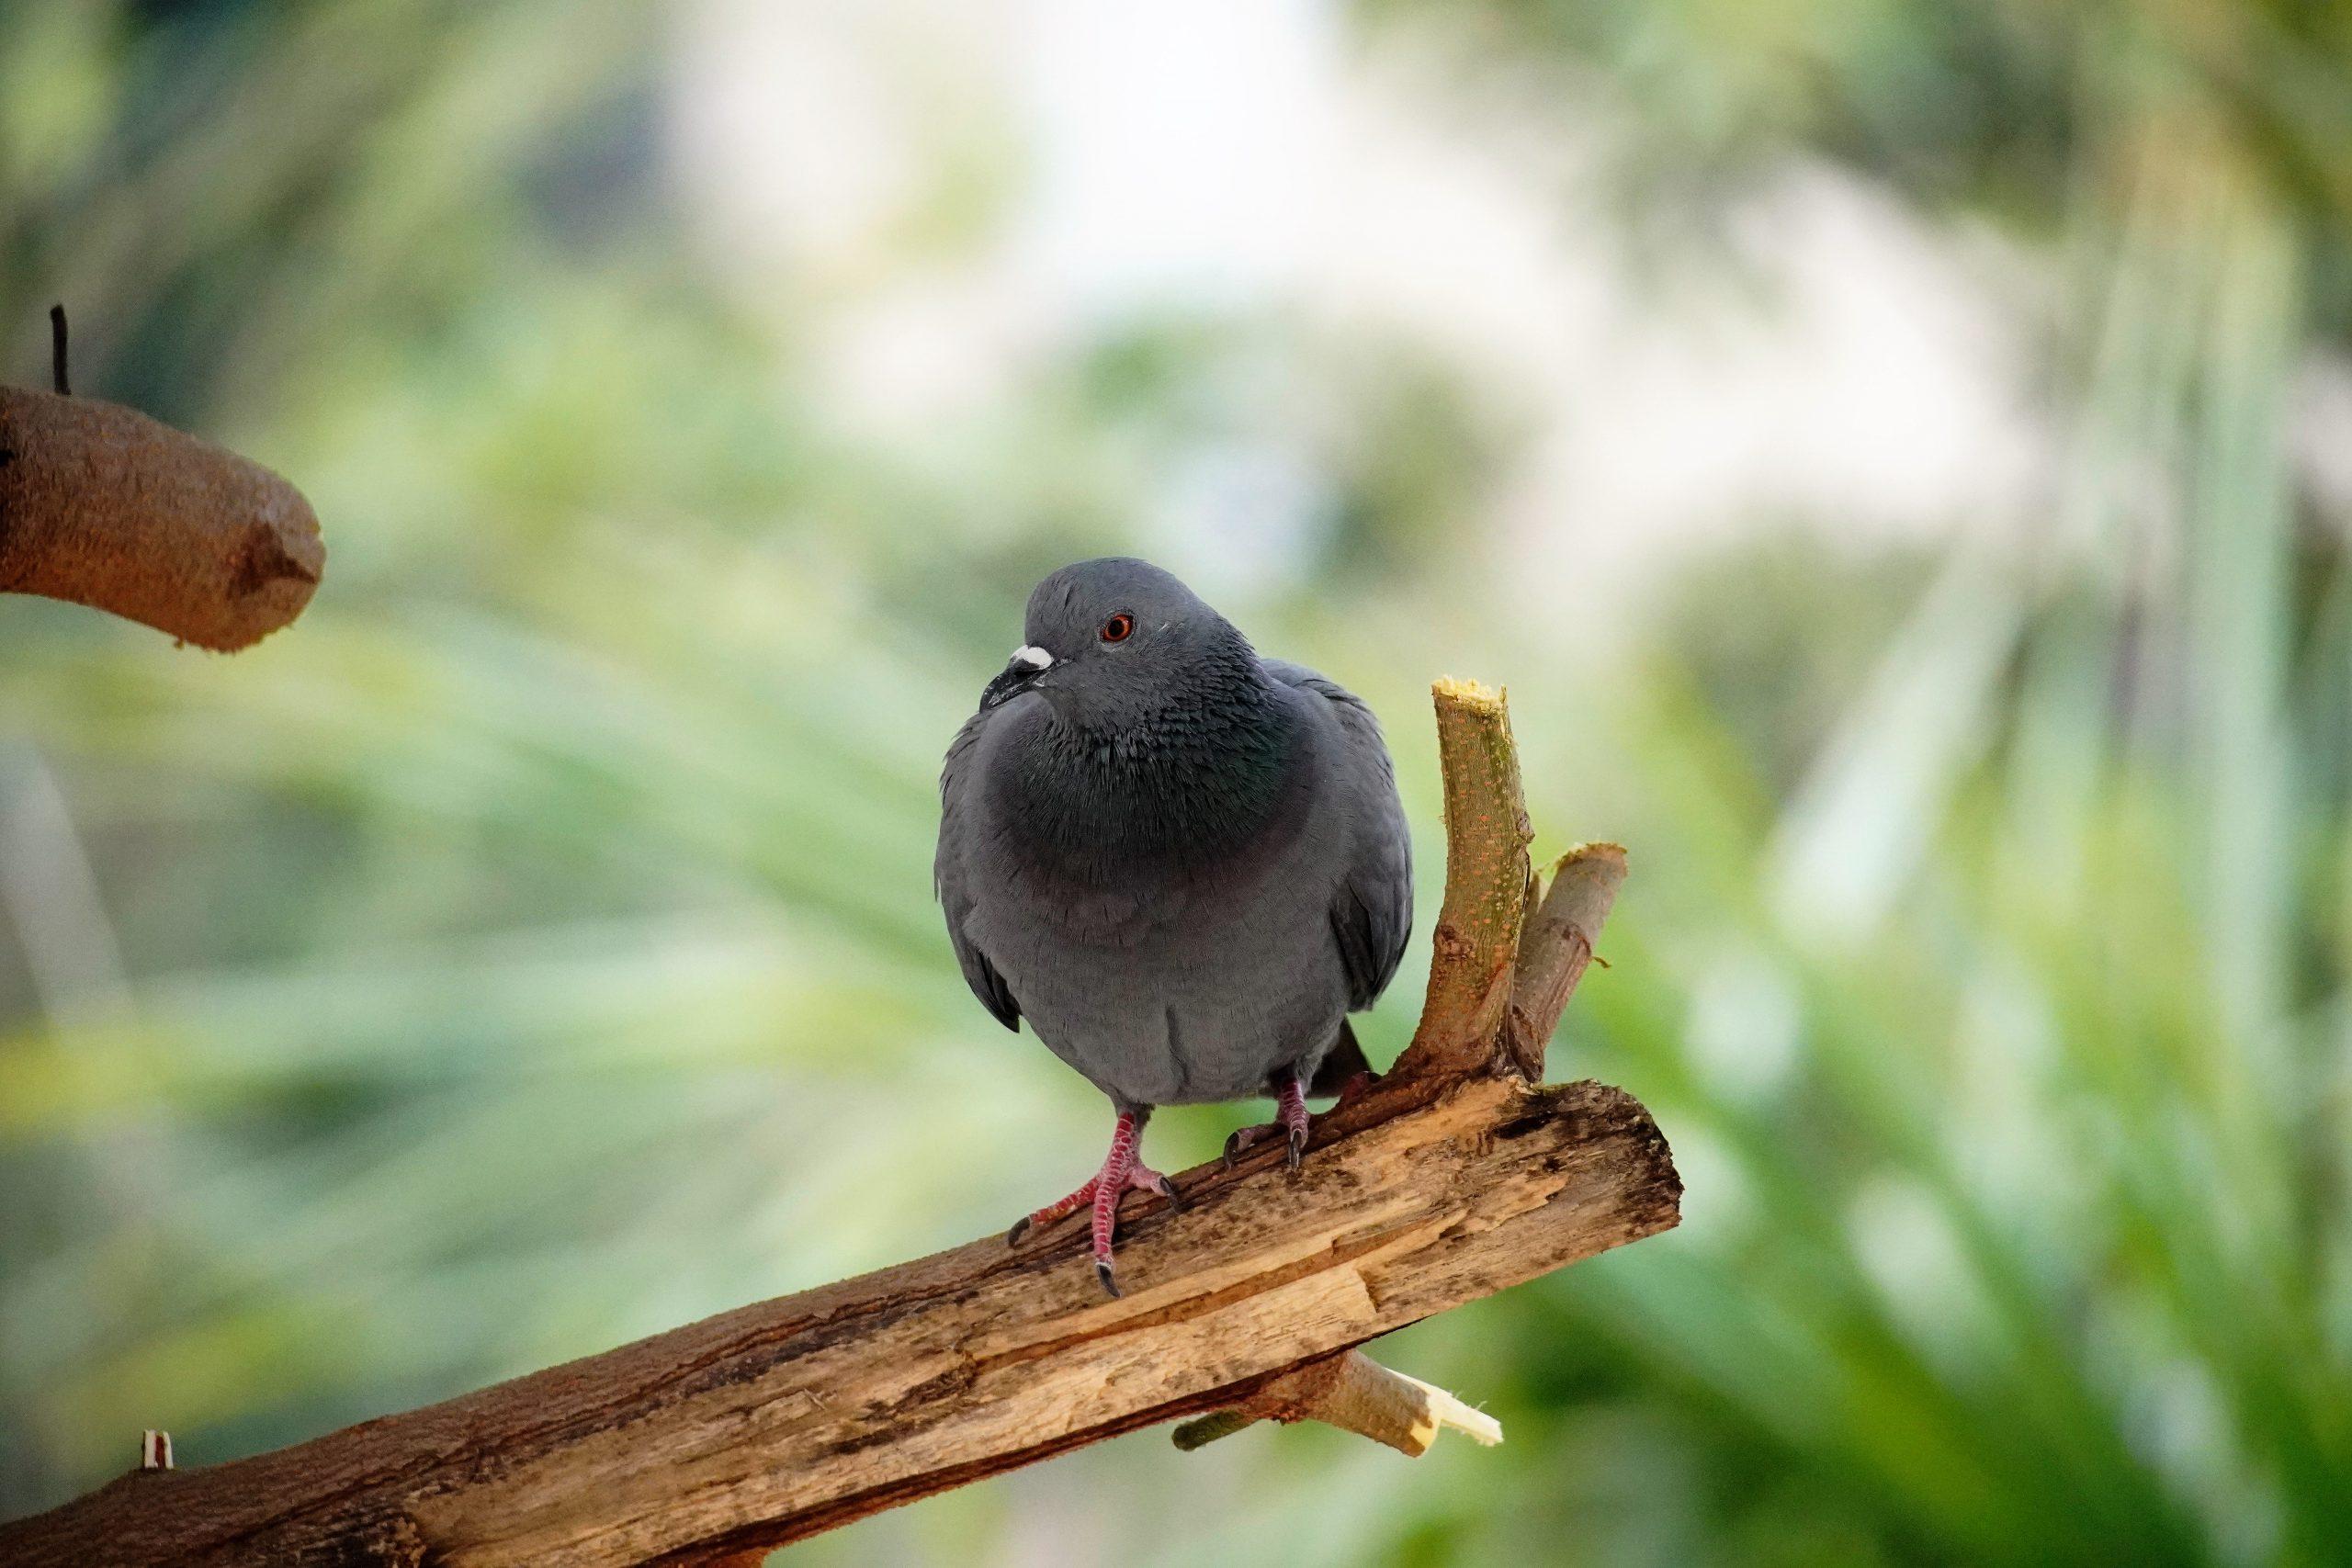 a sitting pigeon